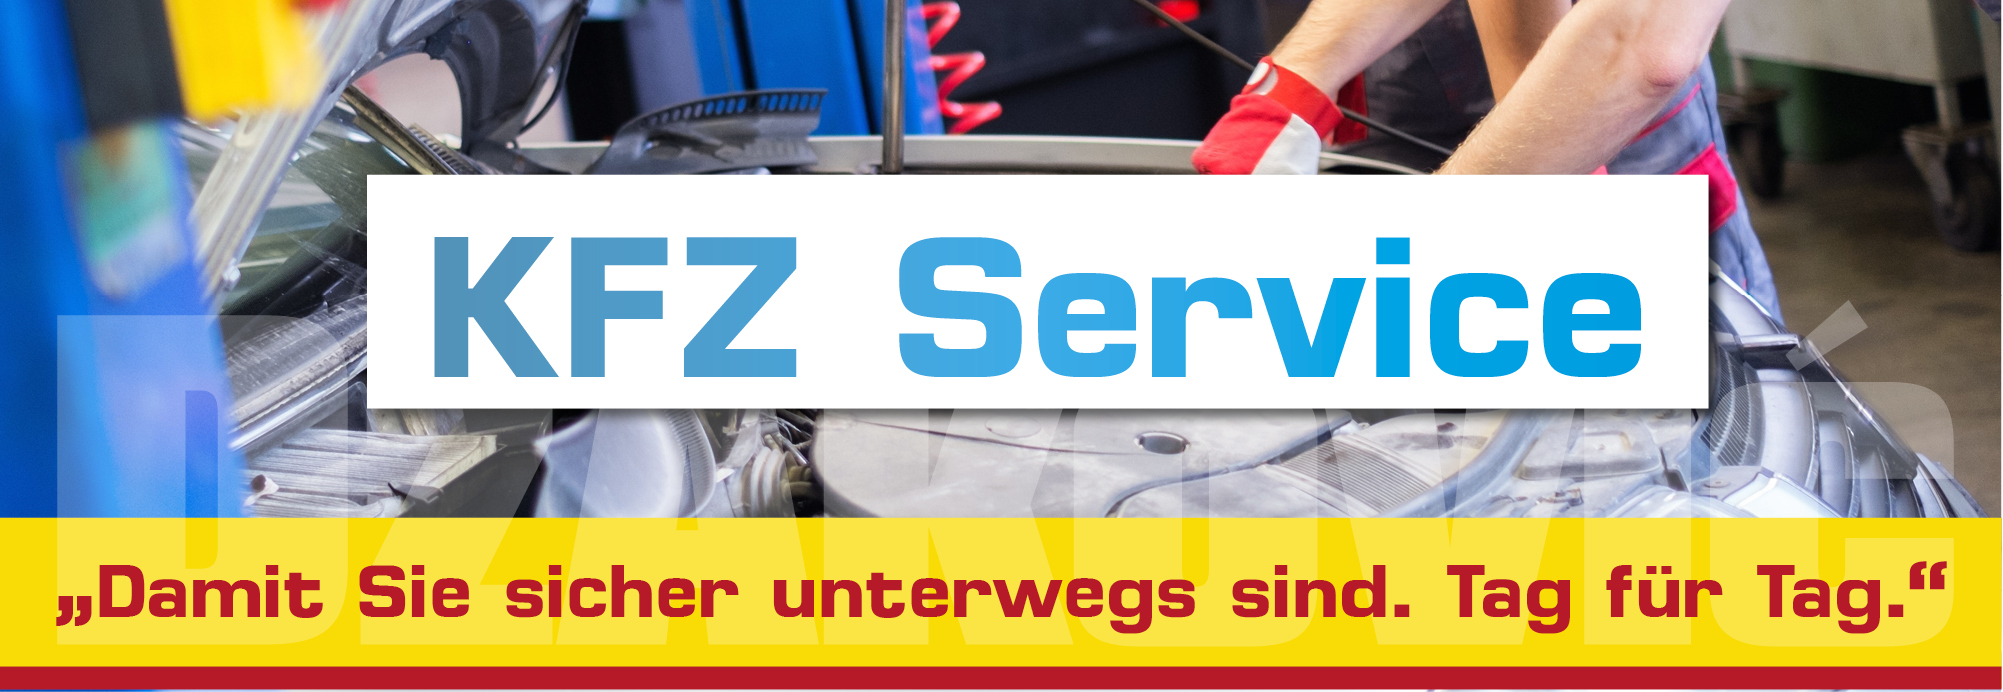 KFZ-autohaus-dzakovic-kfz-reparaturen-reifenwechsel